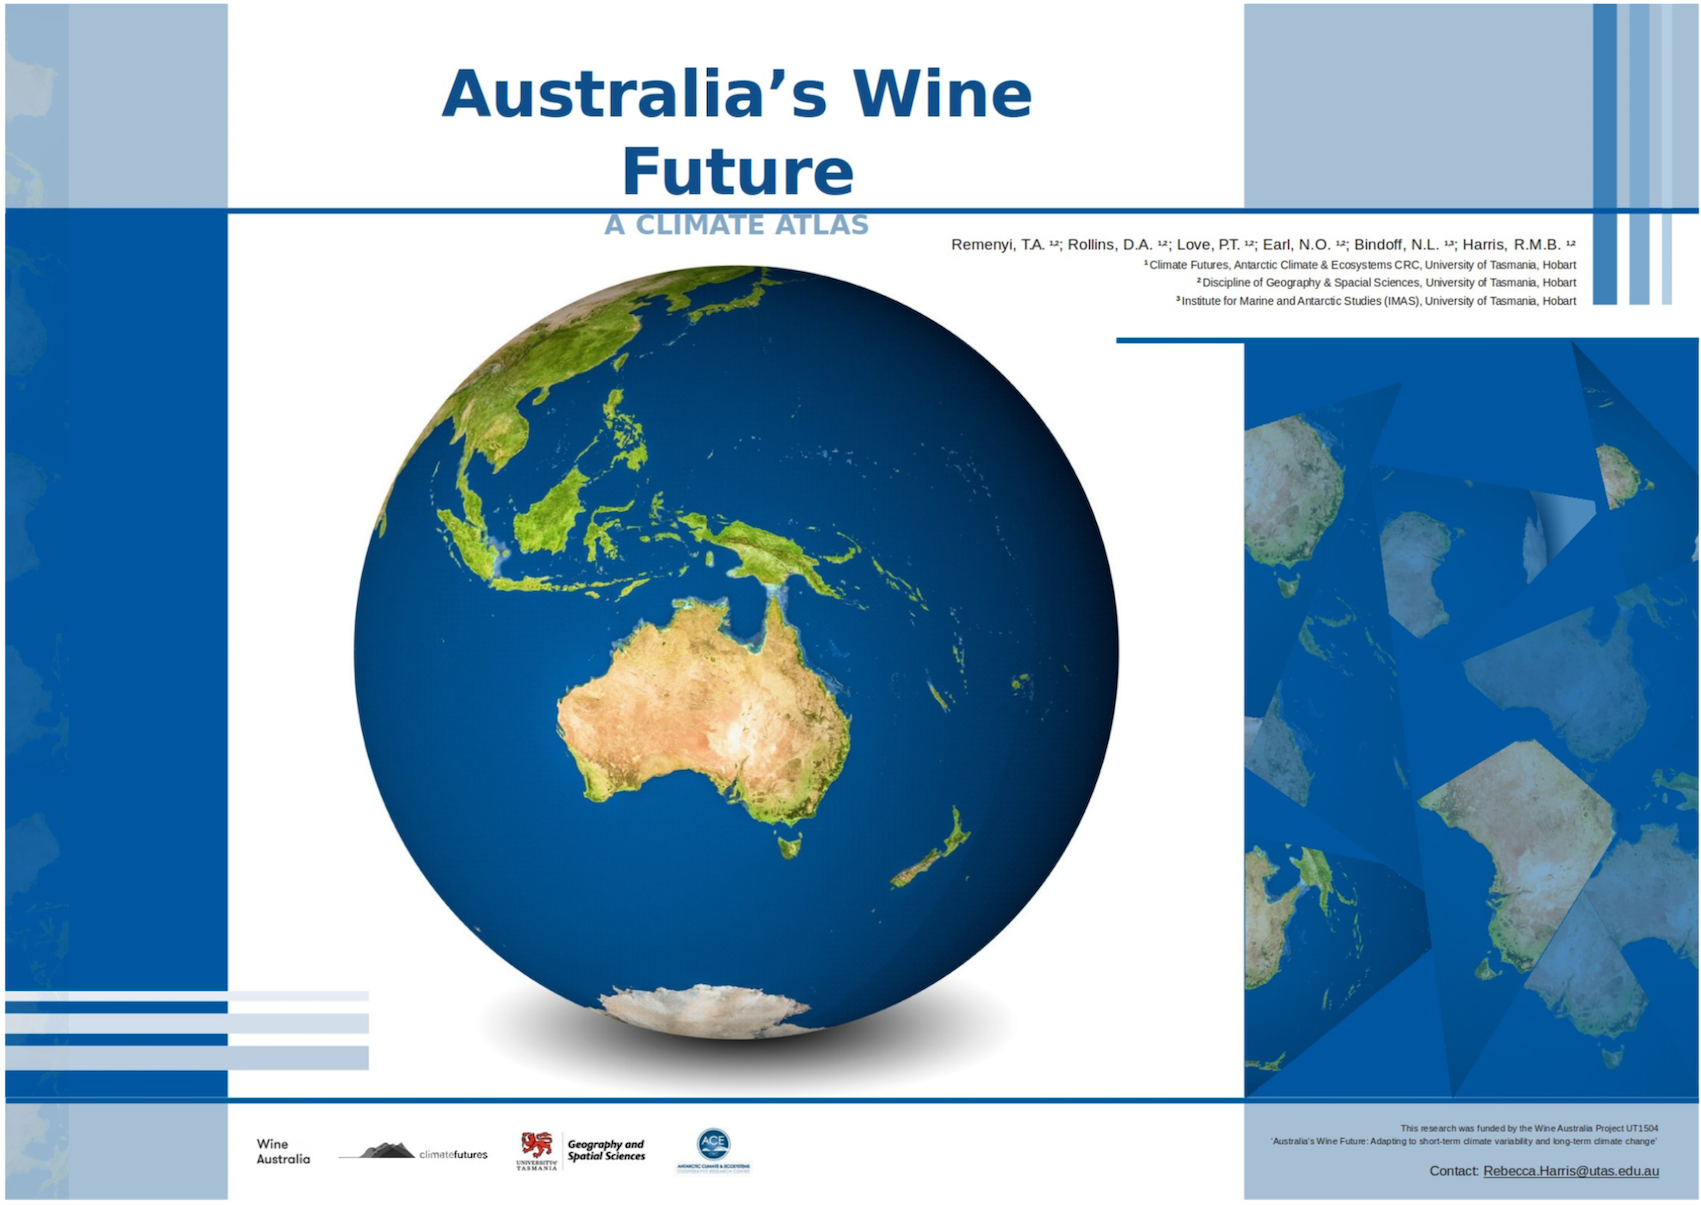 Australia's Wine Future: A Climate Atlas